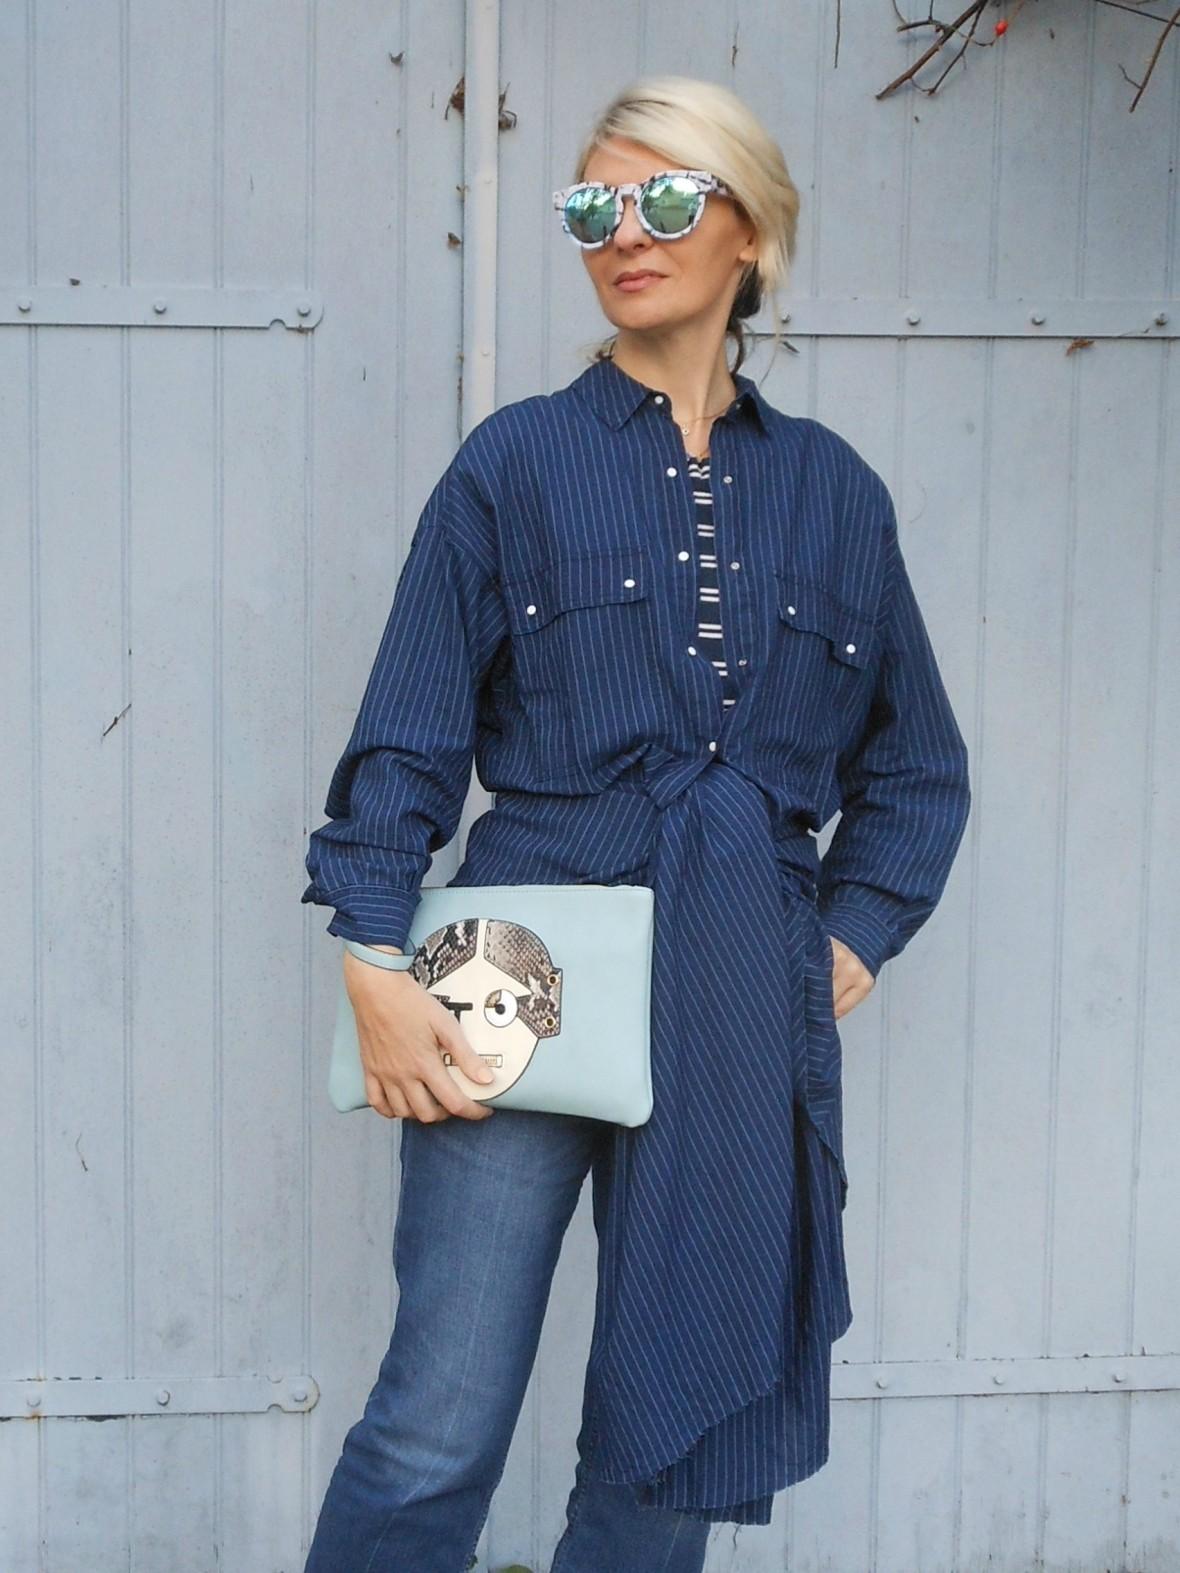 Carmen de Jong-Tirnoveanu fashion blogger, Dutch fashion blogger, Romanian fashion blogger